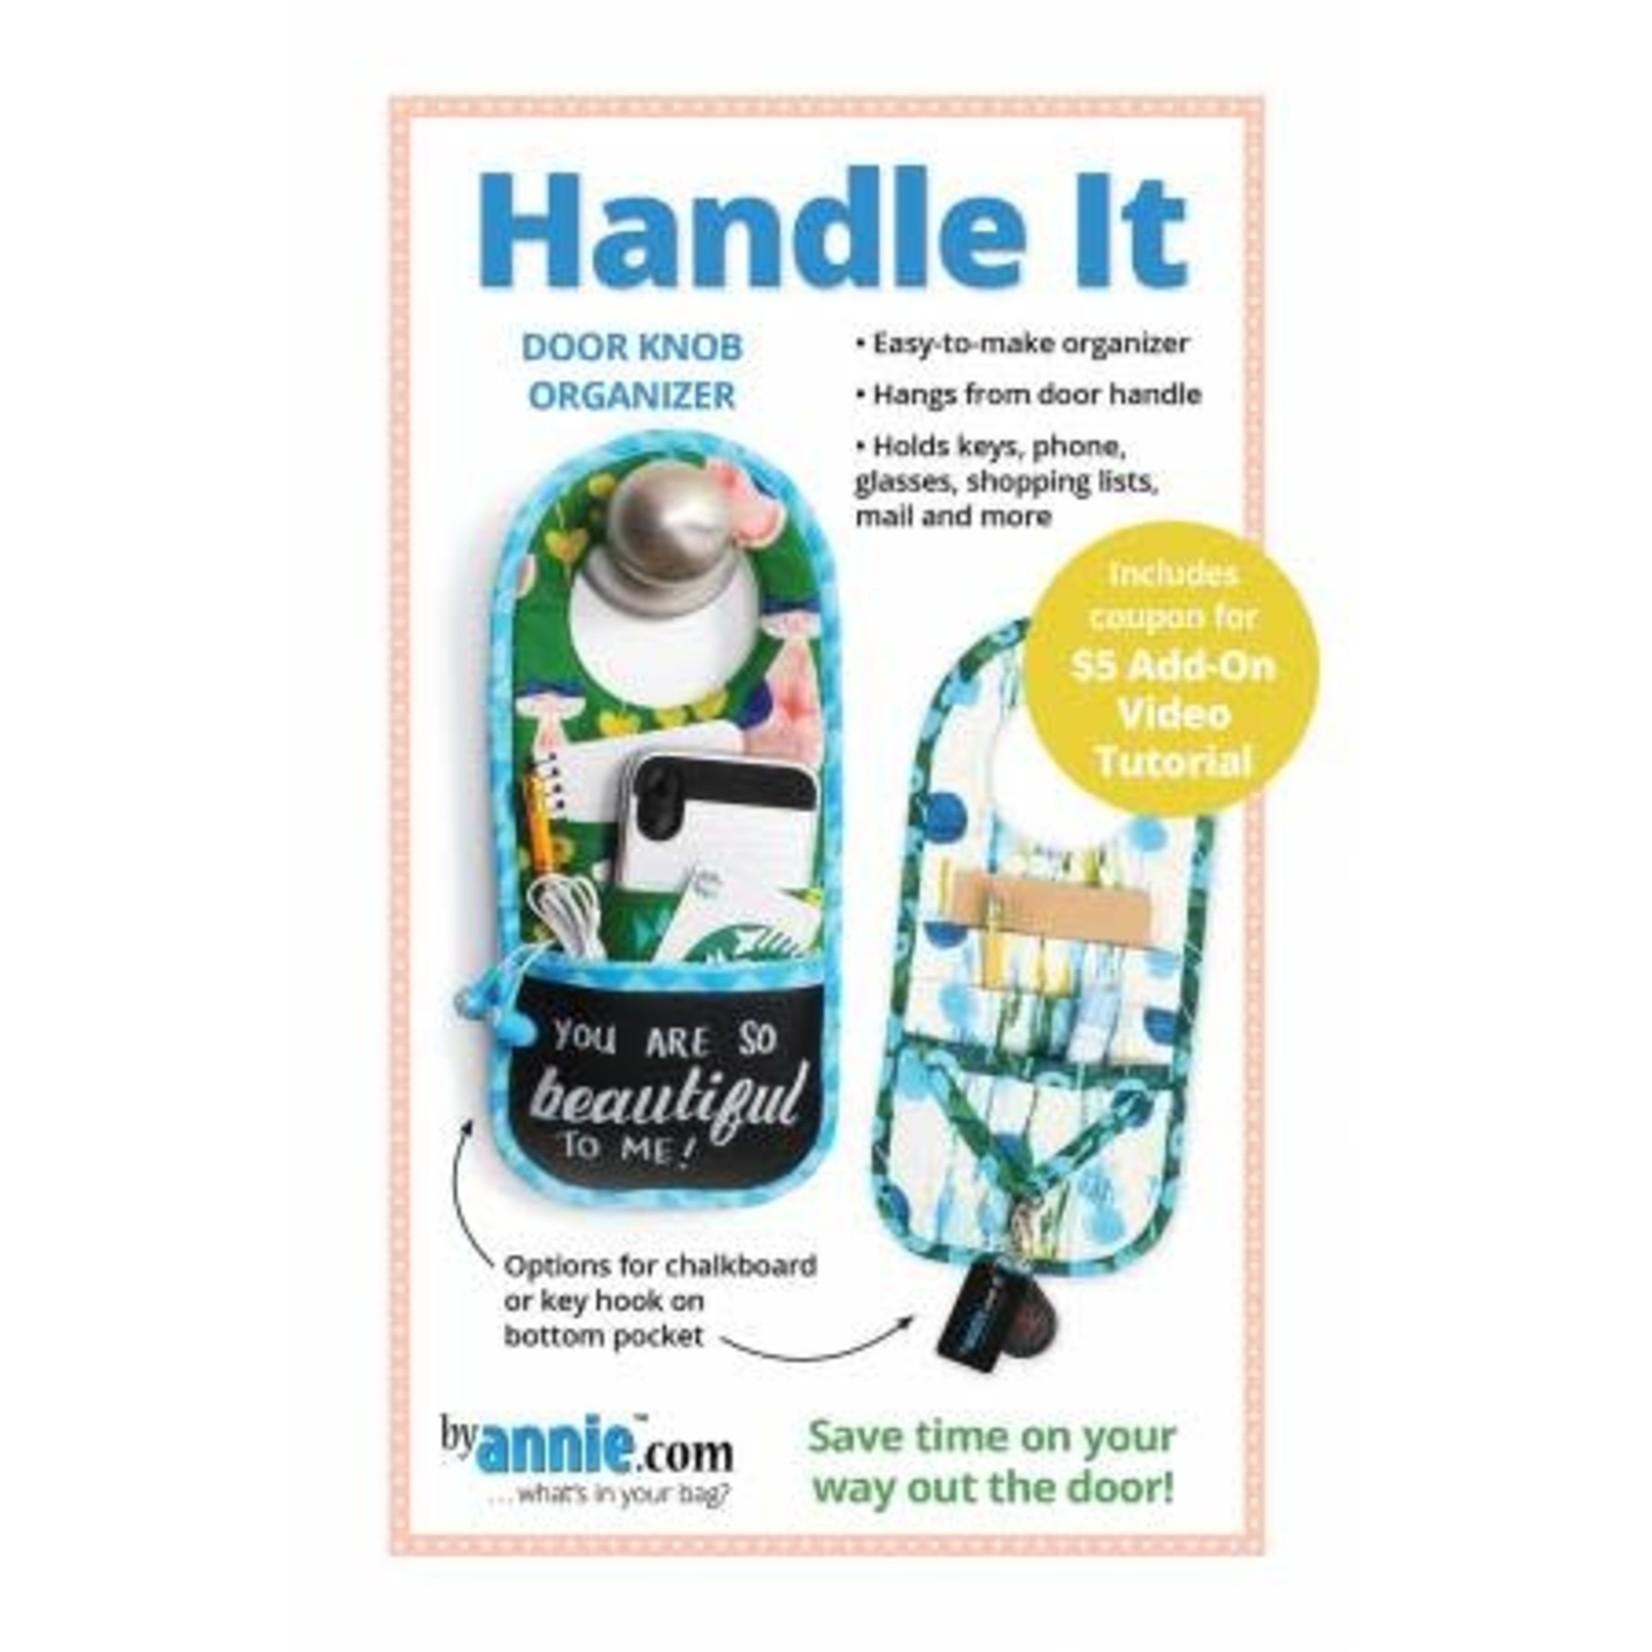 Handle It - Door knob organizer - by Annie.com